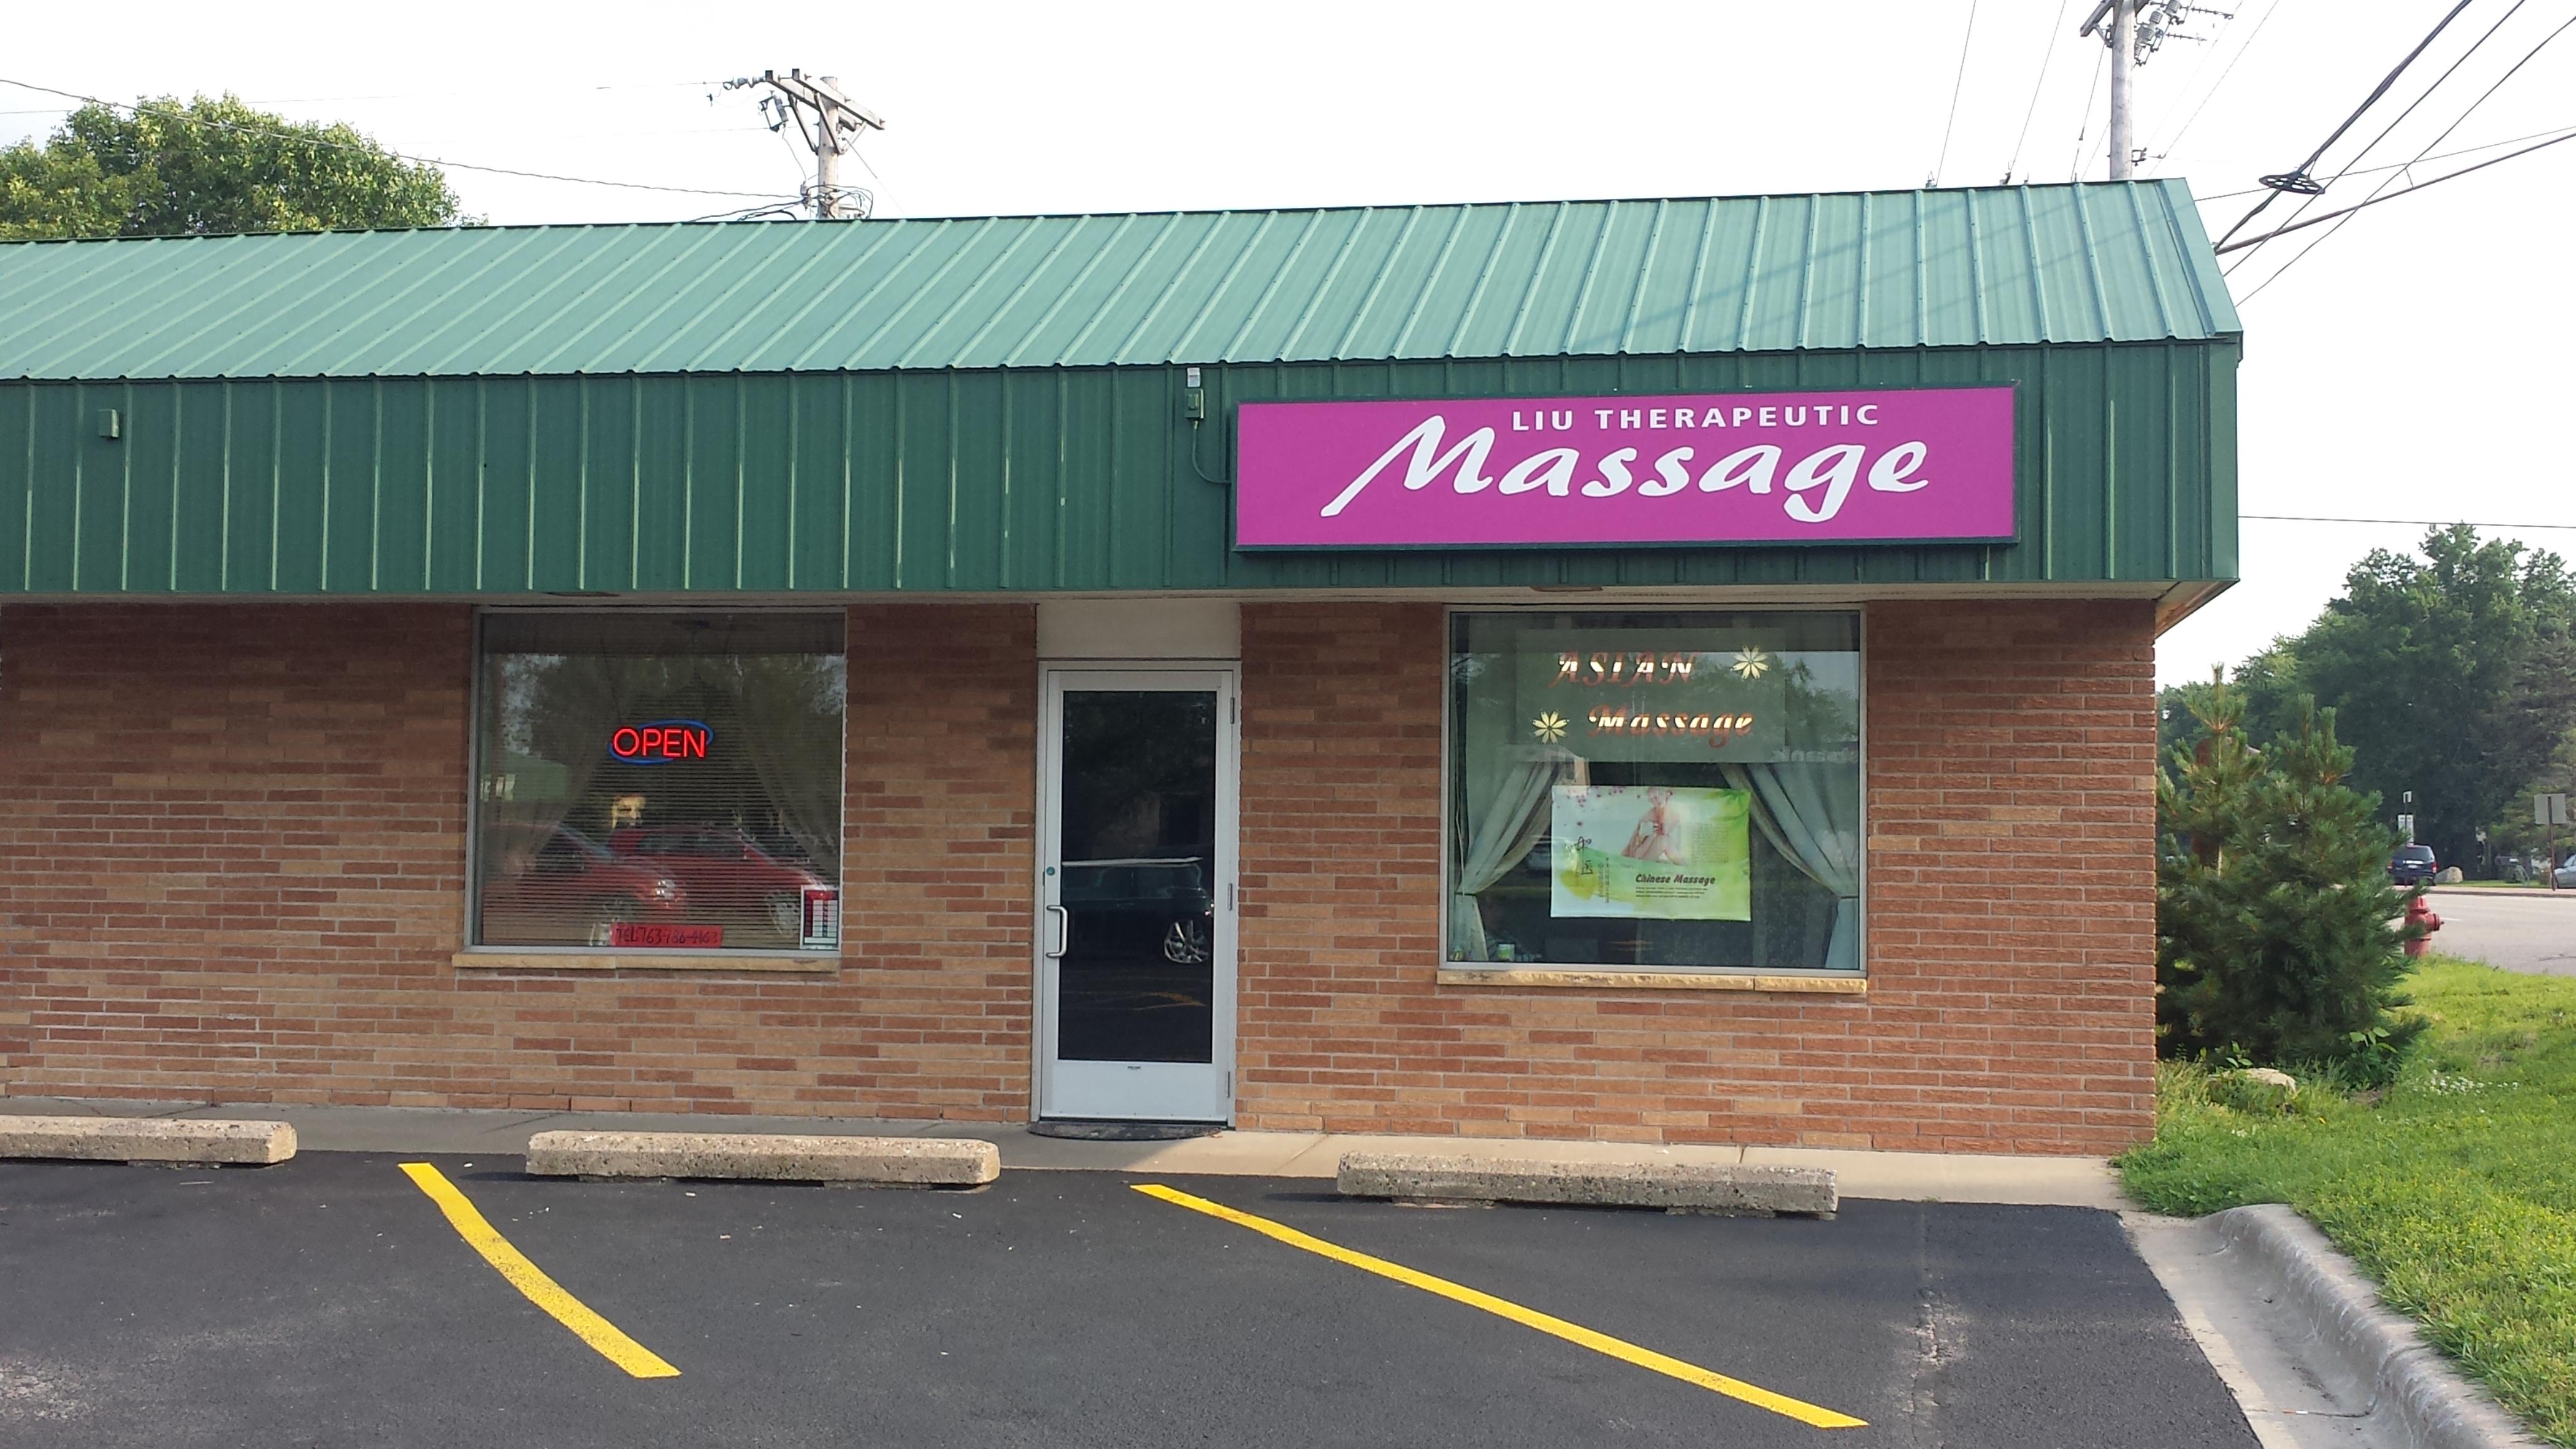 Window Tinting Mn >> Liu Therapeutic Massage 9201 Lexington Ave N, Circle Pines, MN 55014 - YP.com